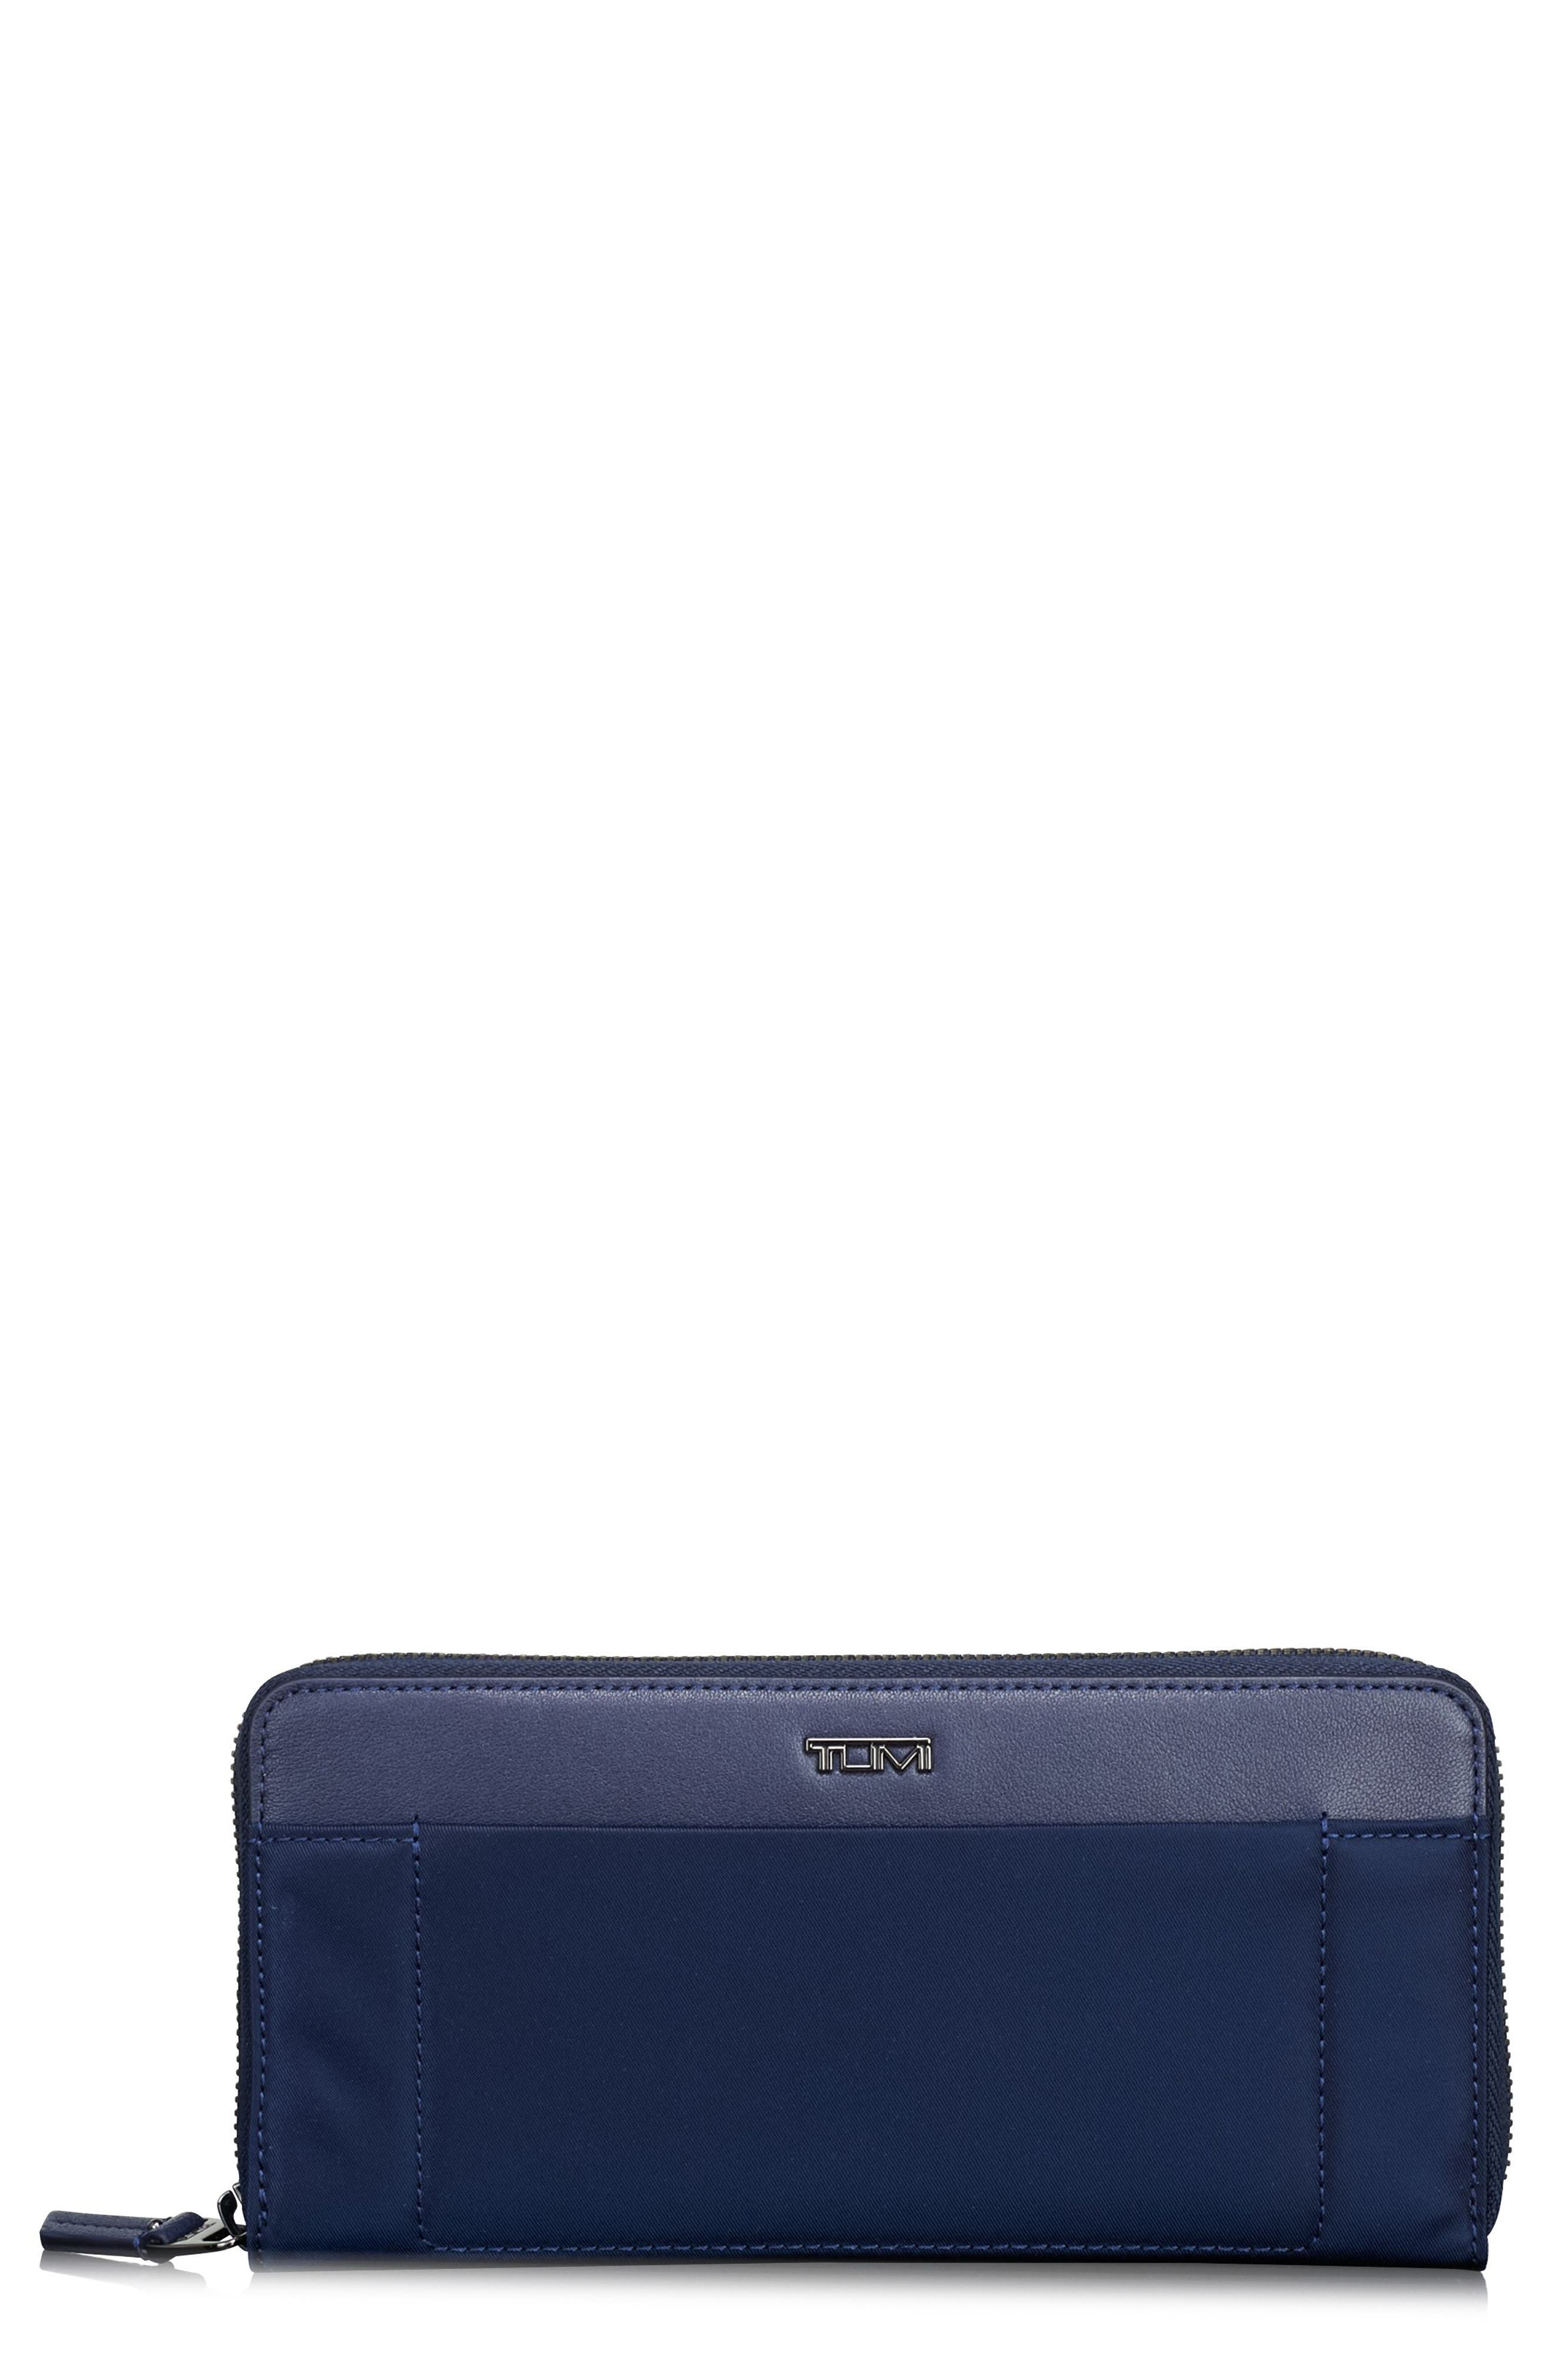 Continental Zip Tech Wallet,                         Main,                         color, Marine